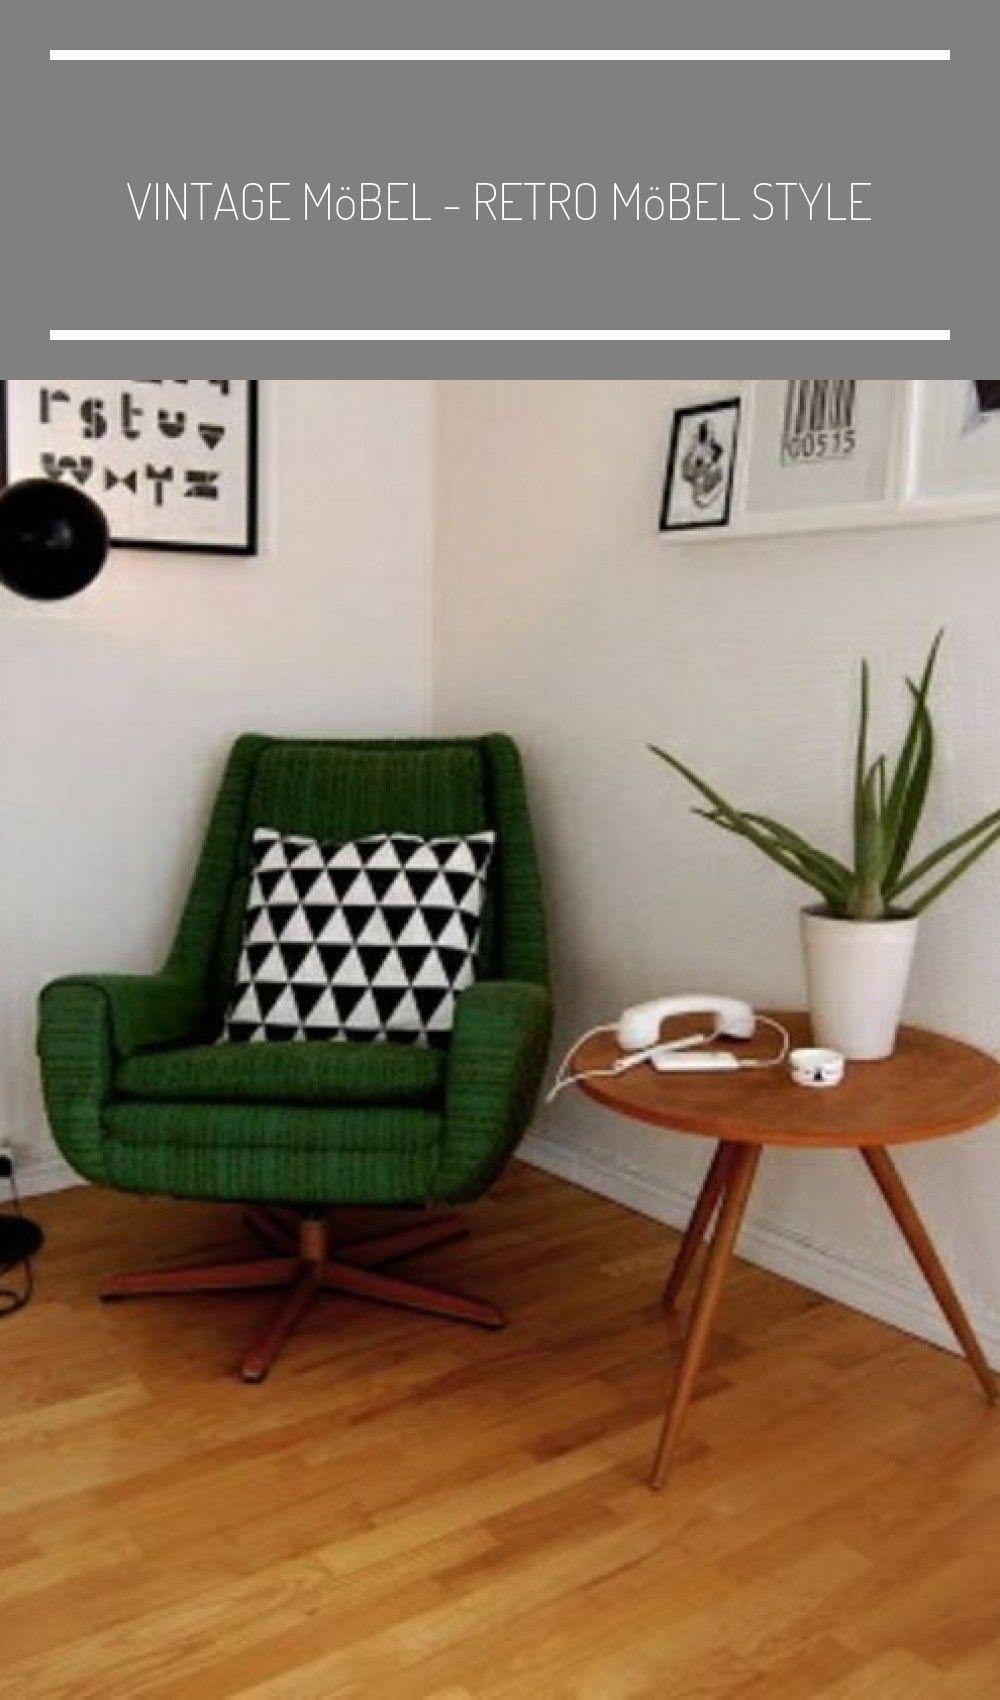 vintage möbel - retro möbel style #altbauwohnung industrial